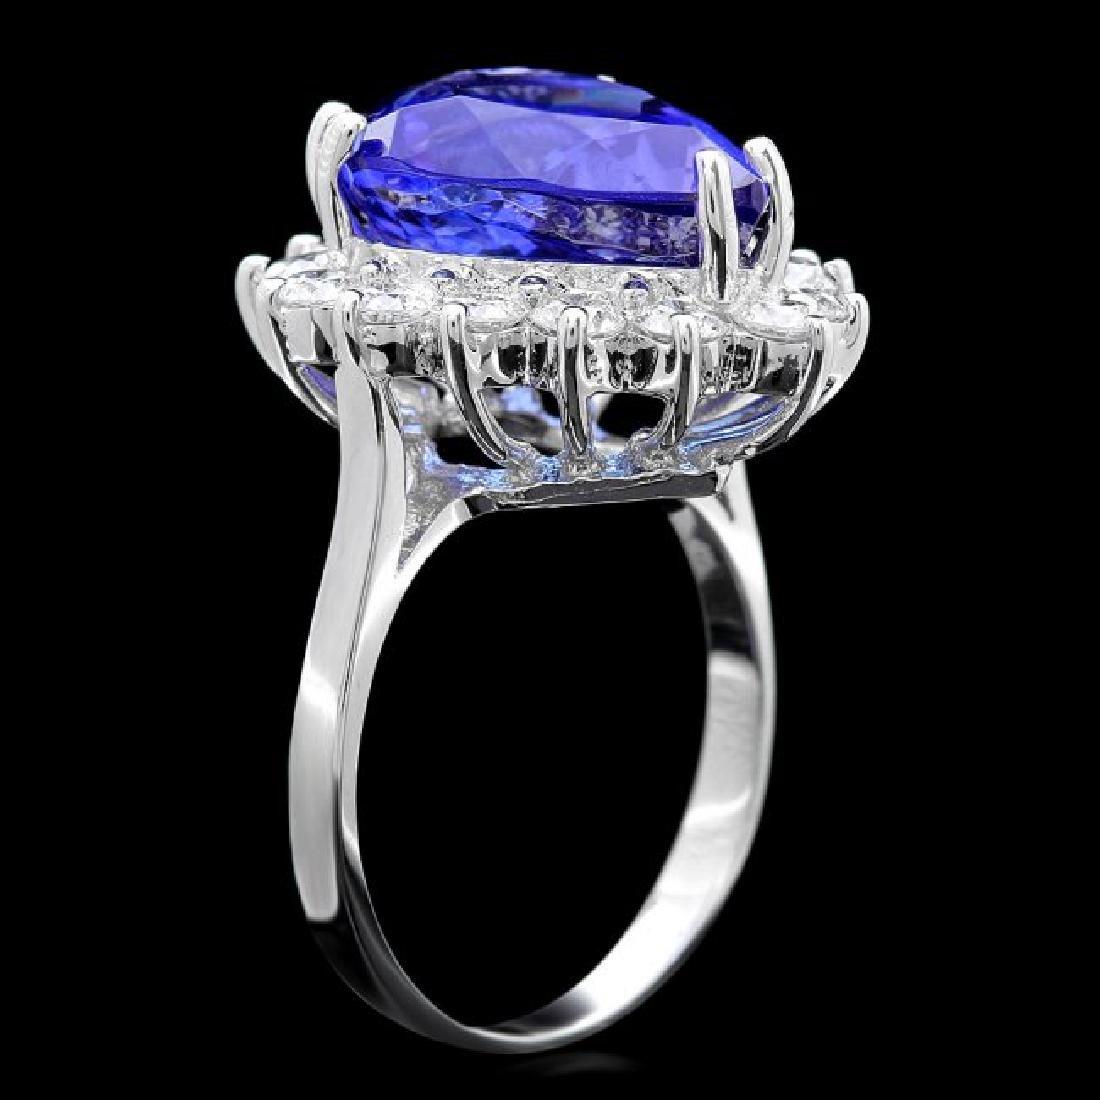 18k Gold 9.00ct Tanzanite 1.35ct Diamond Ring - 3